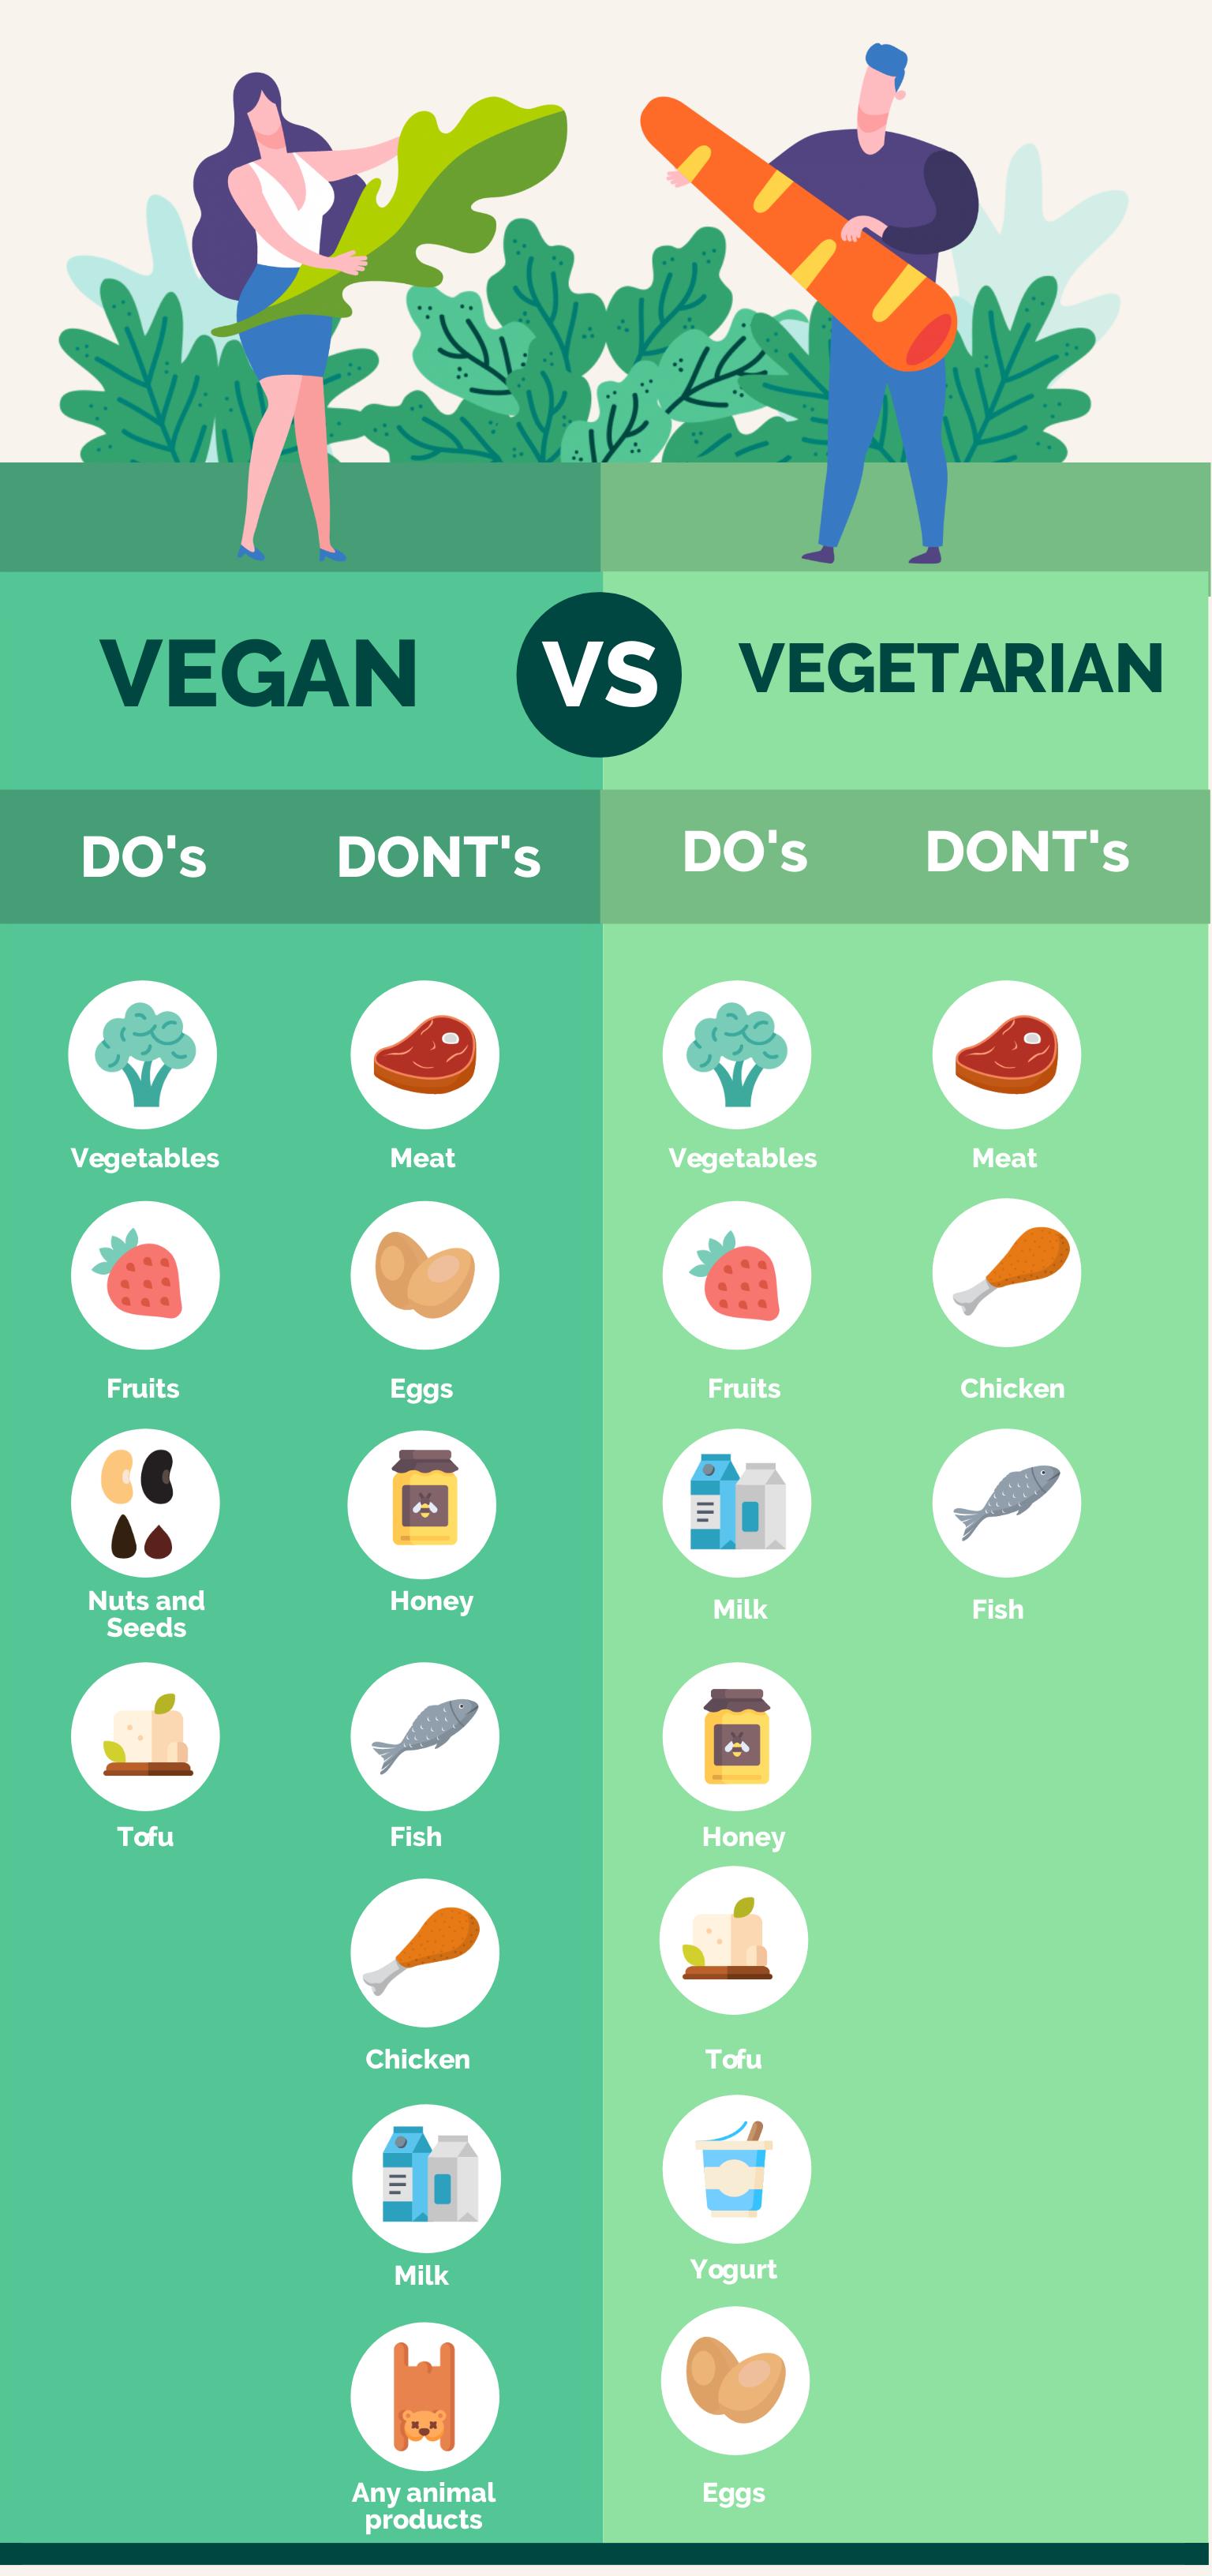 an infographic comparing vegan vs vegetarian diets.